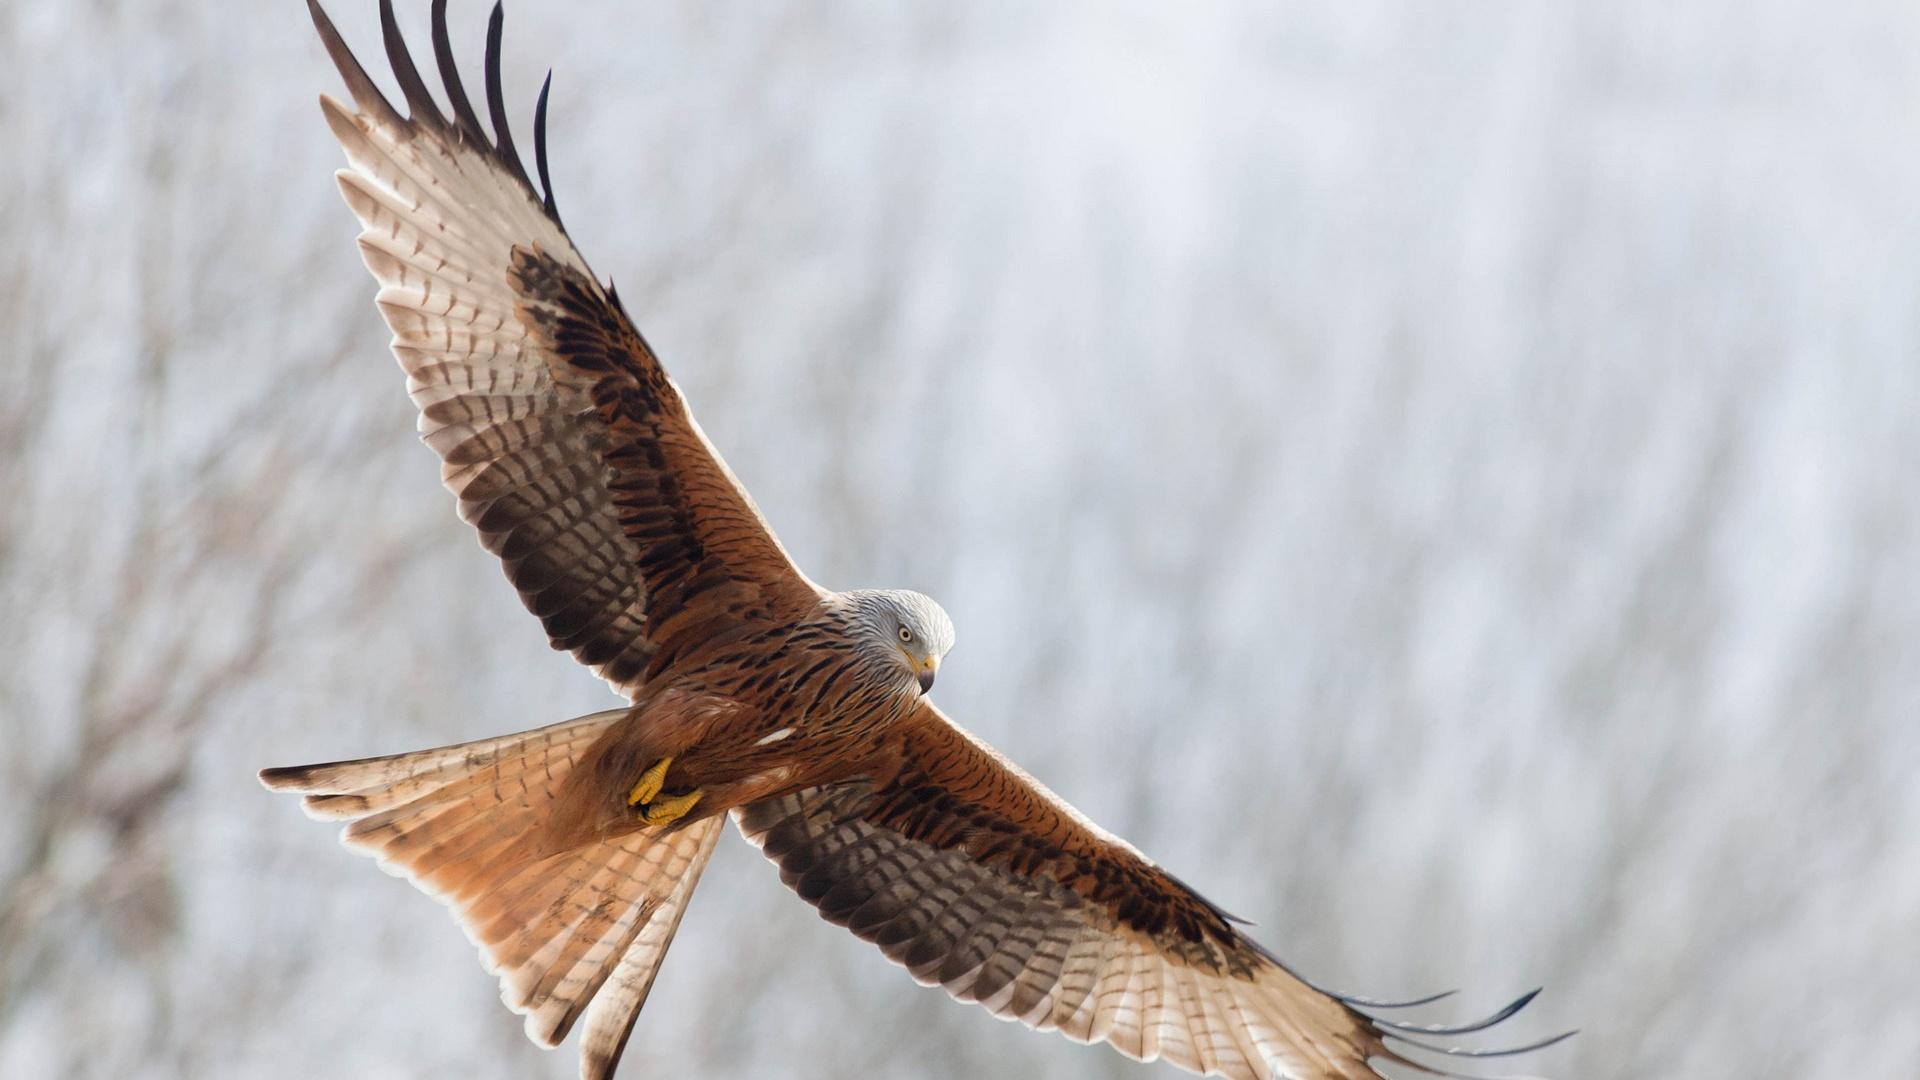 Freedom Birds Flying Hd Wallpaper Bird: Adler Offenen Flügeln Freiheit Fliegen 1920x1200 HD